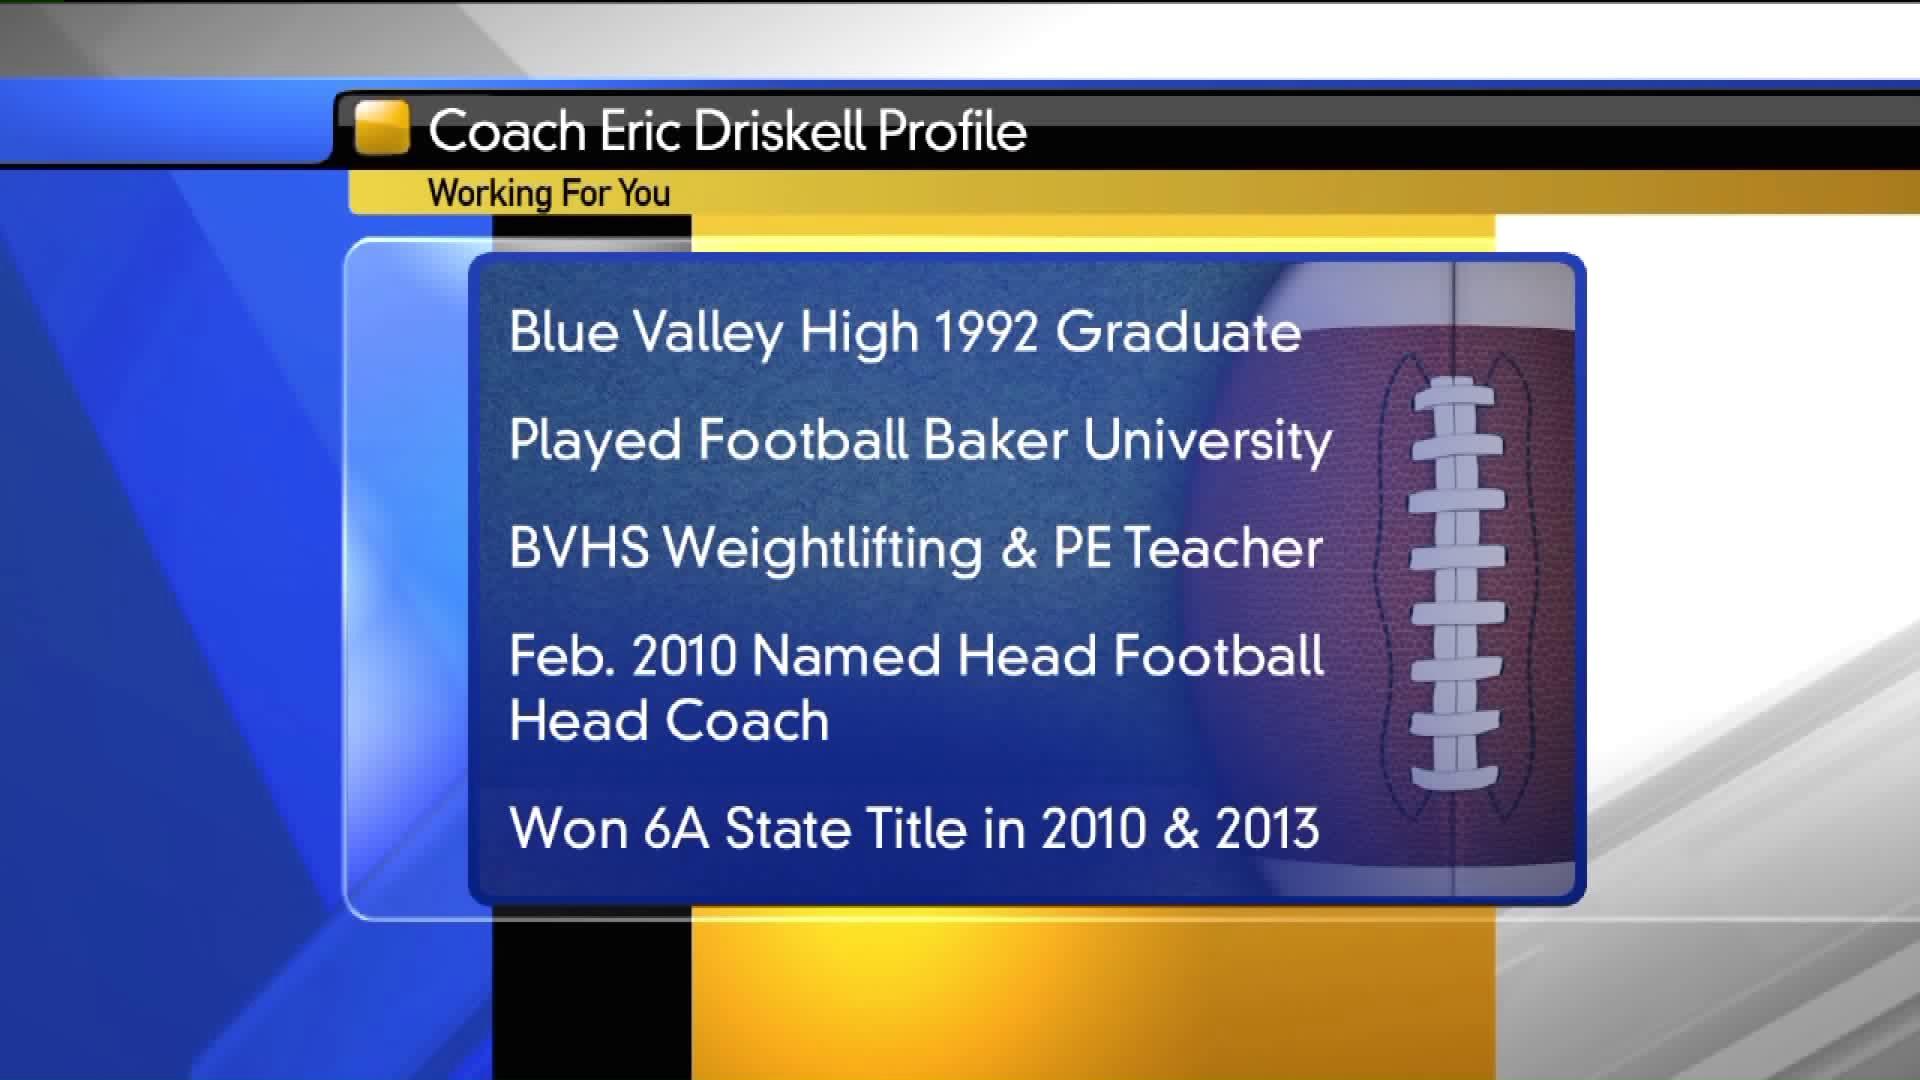 Coach Eric Driskell